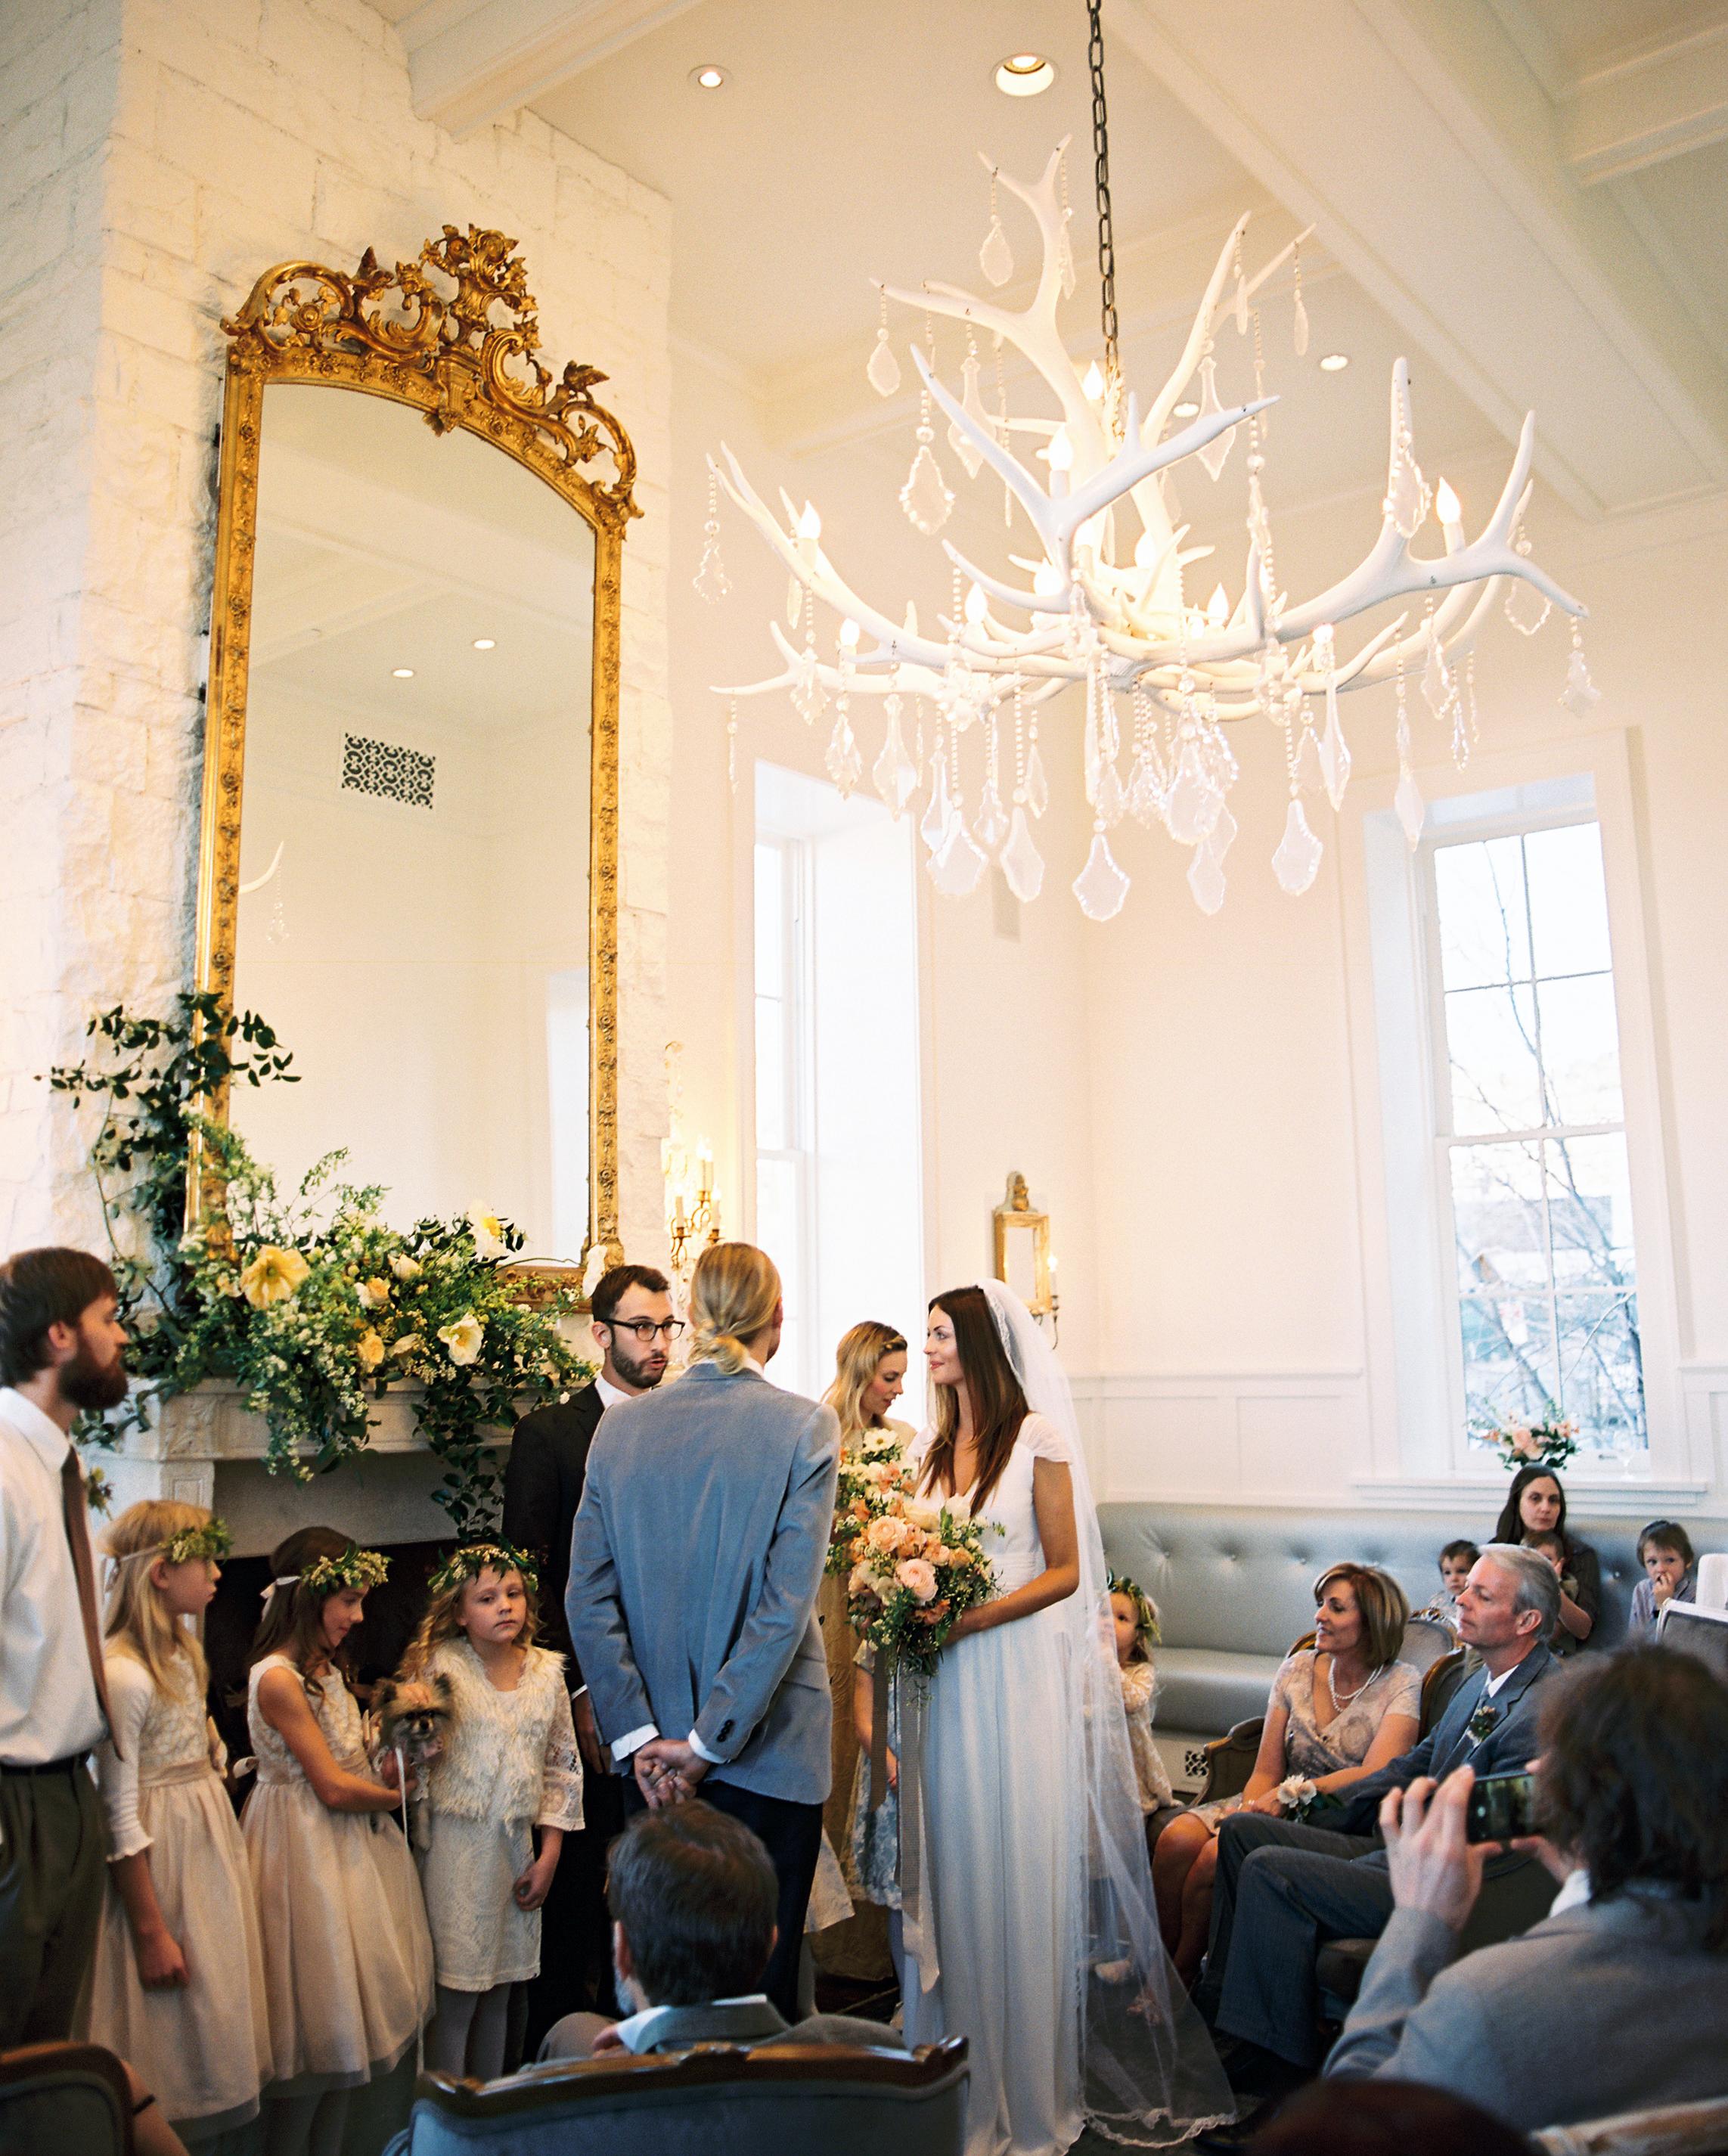 rachel-tyson-wedding-ceremony-069-s112158-0915.jpg